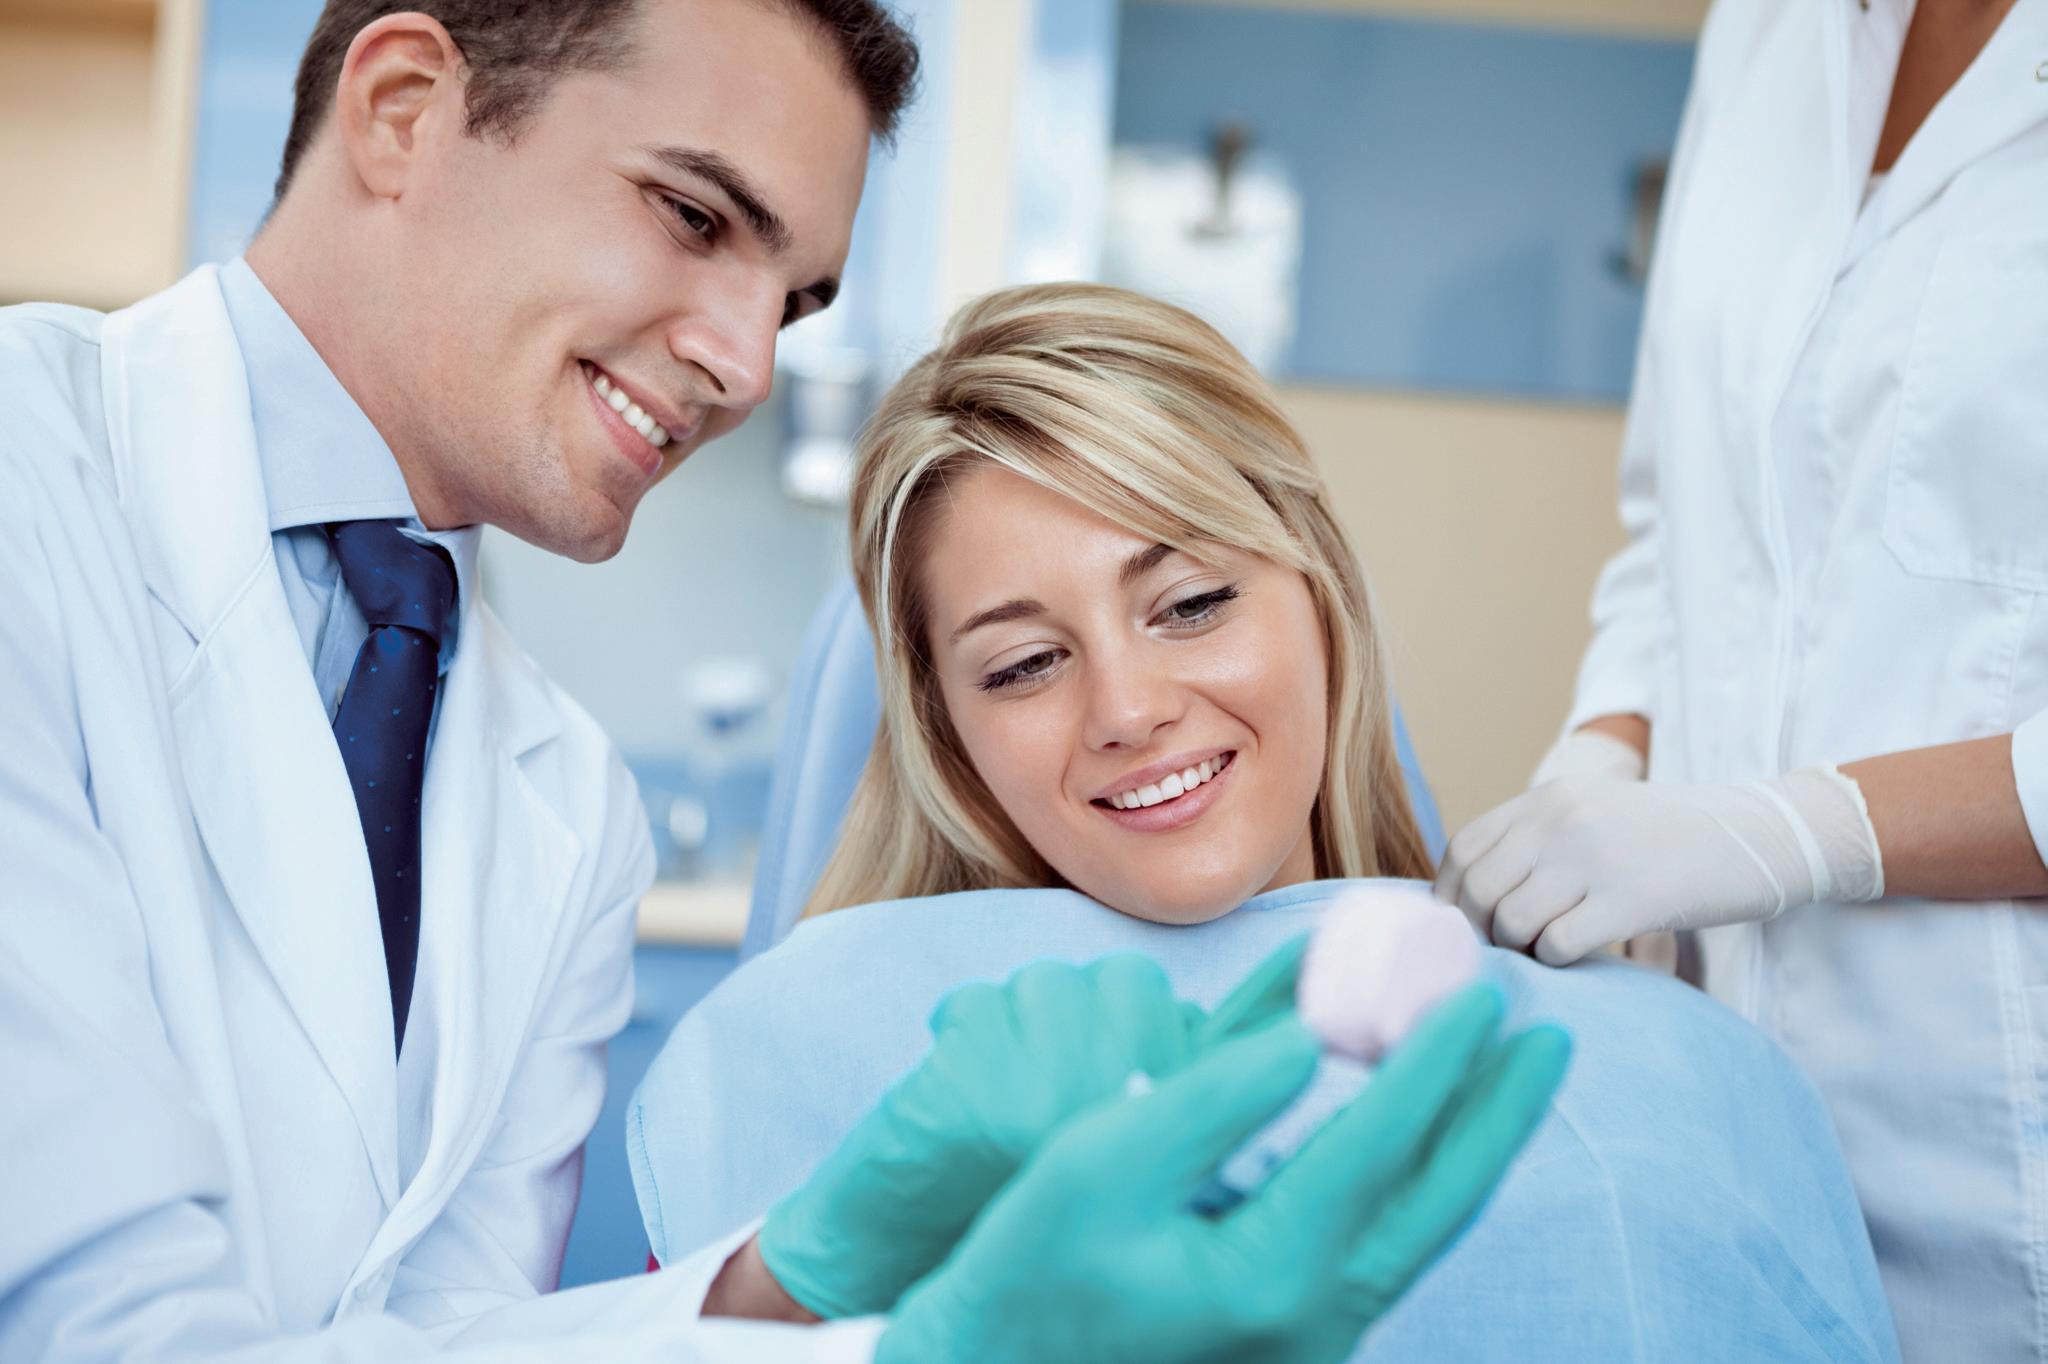 Brez strahu k zobarju